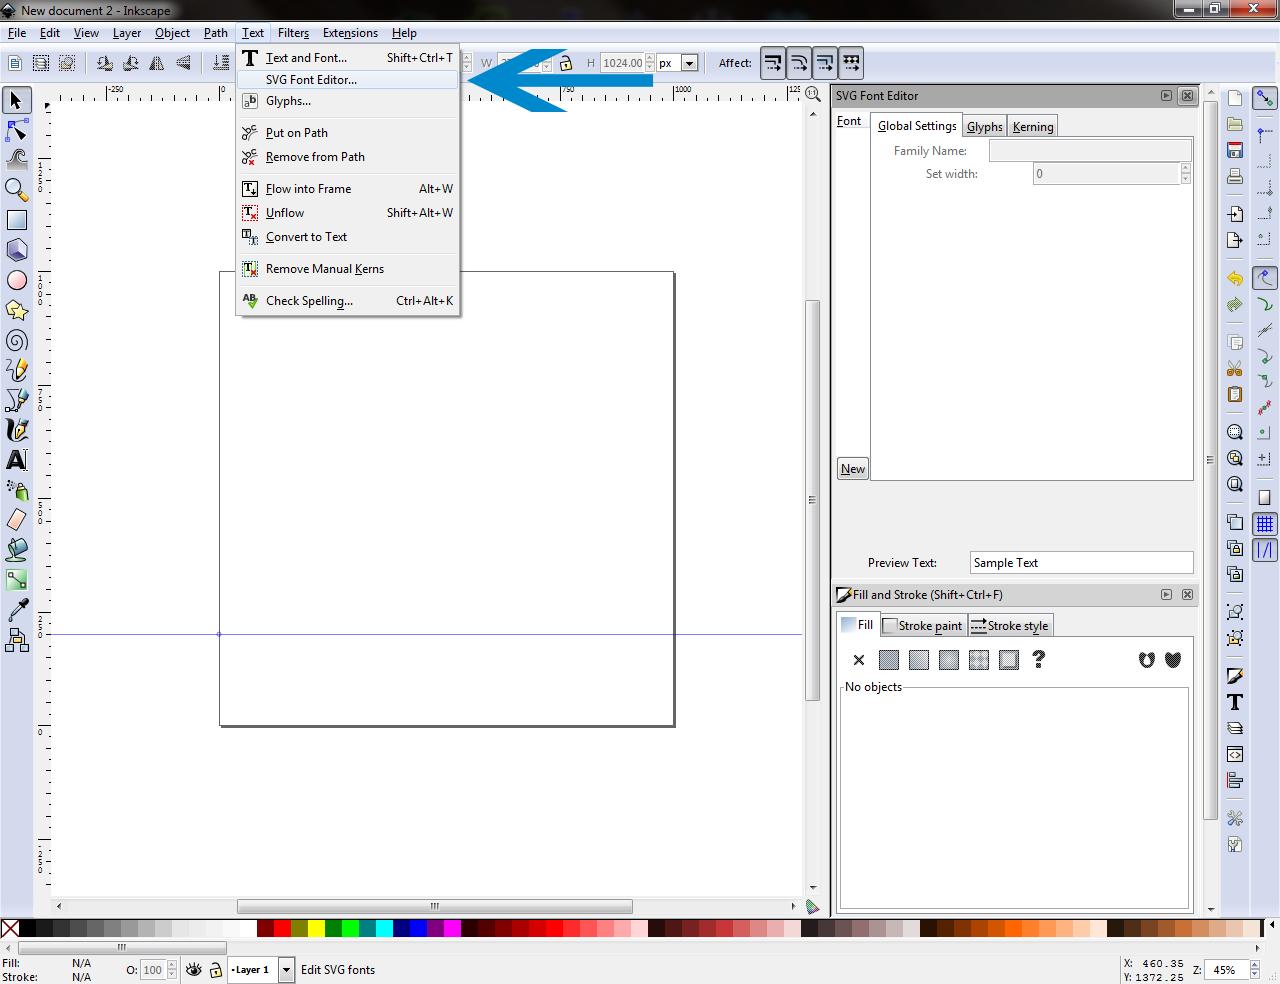 SVG Font Editor Pane